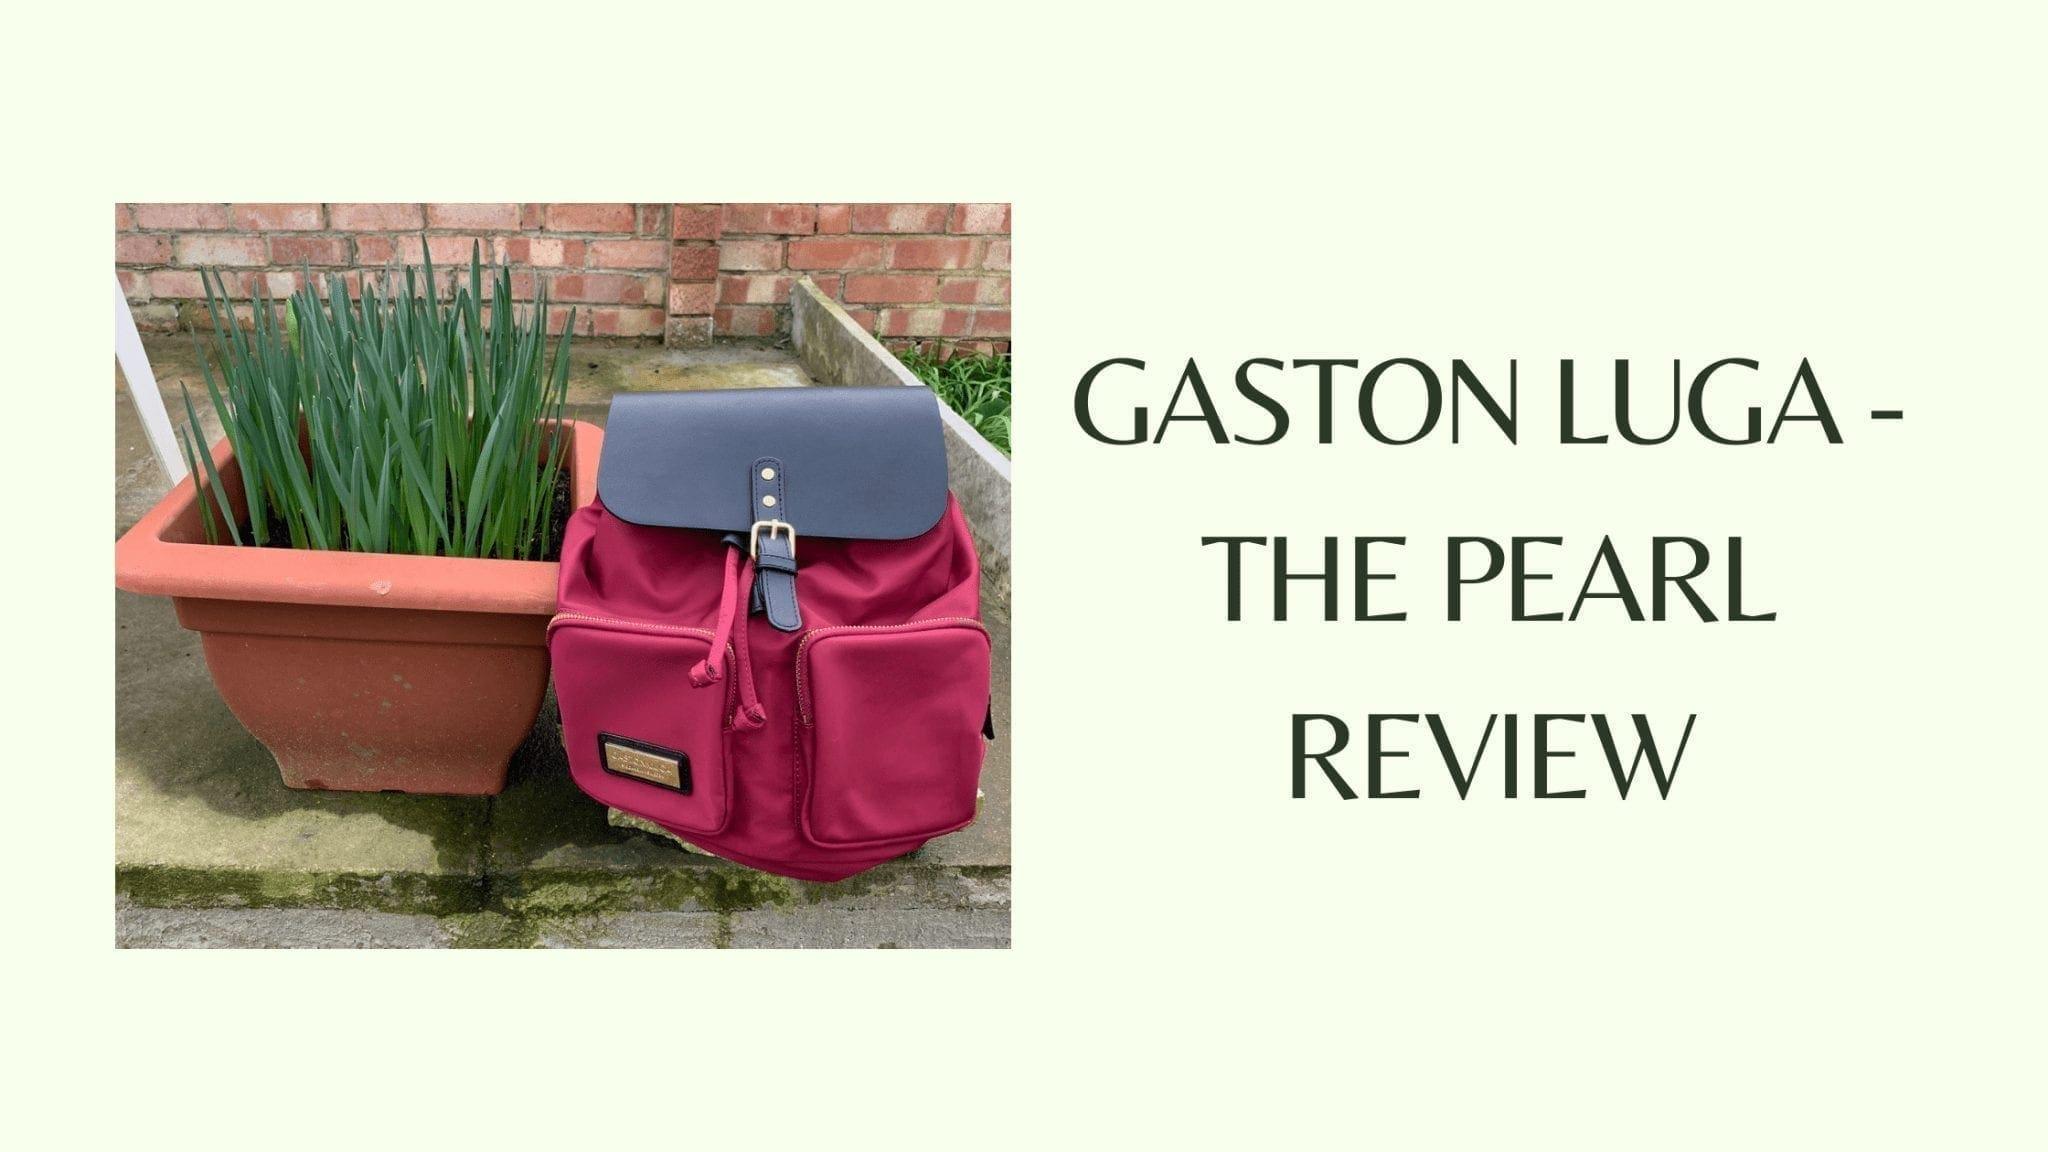 Gaston Luga - The Pearl Review